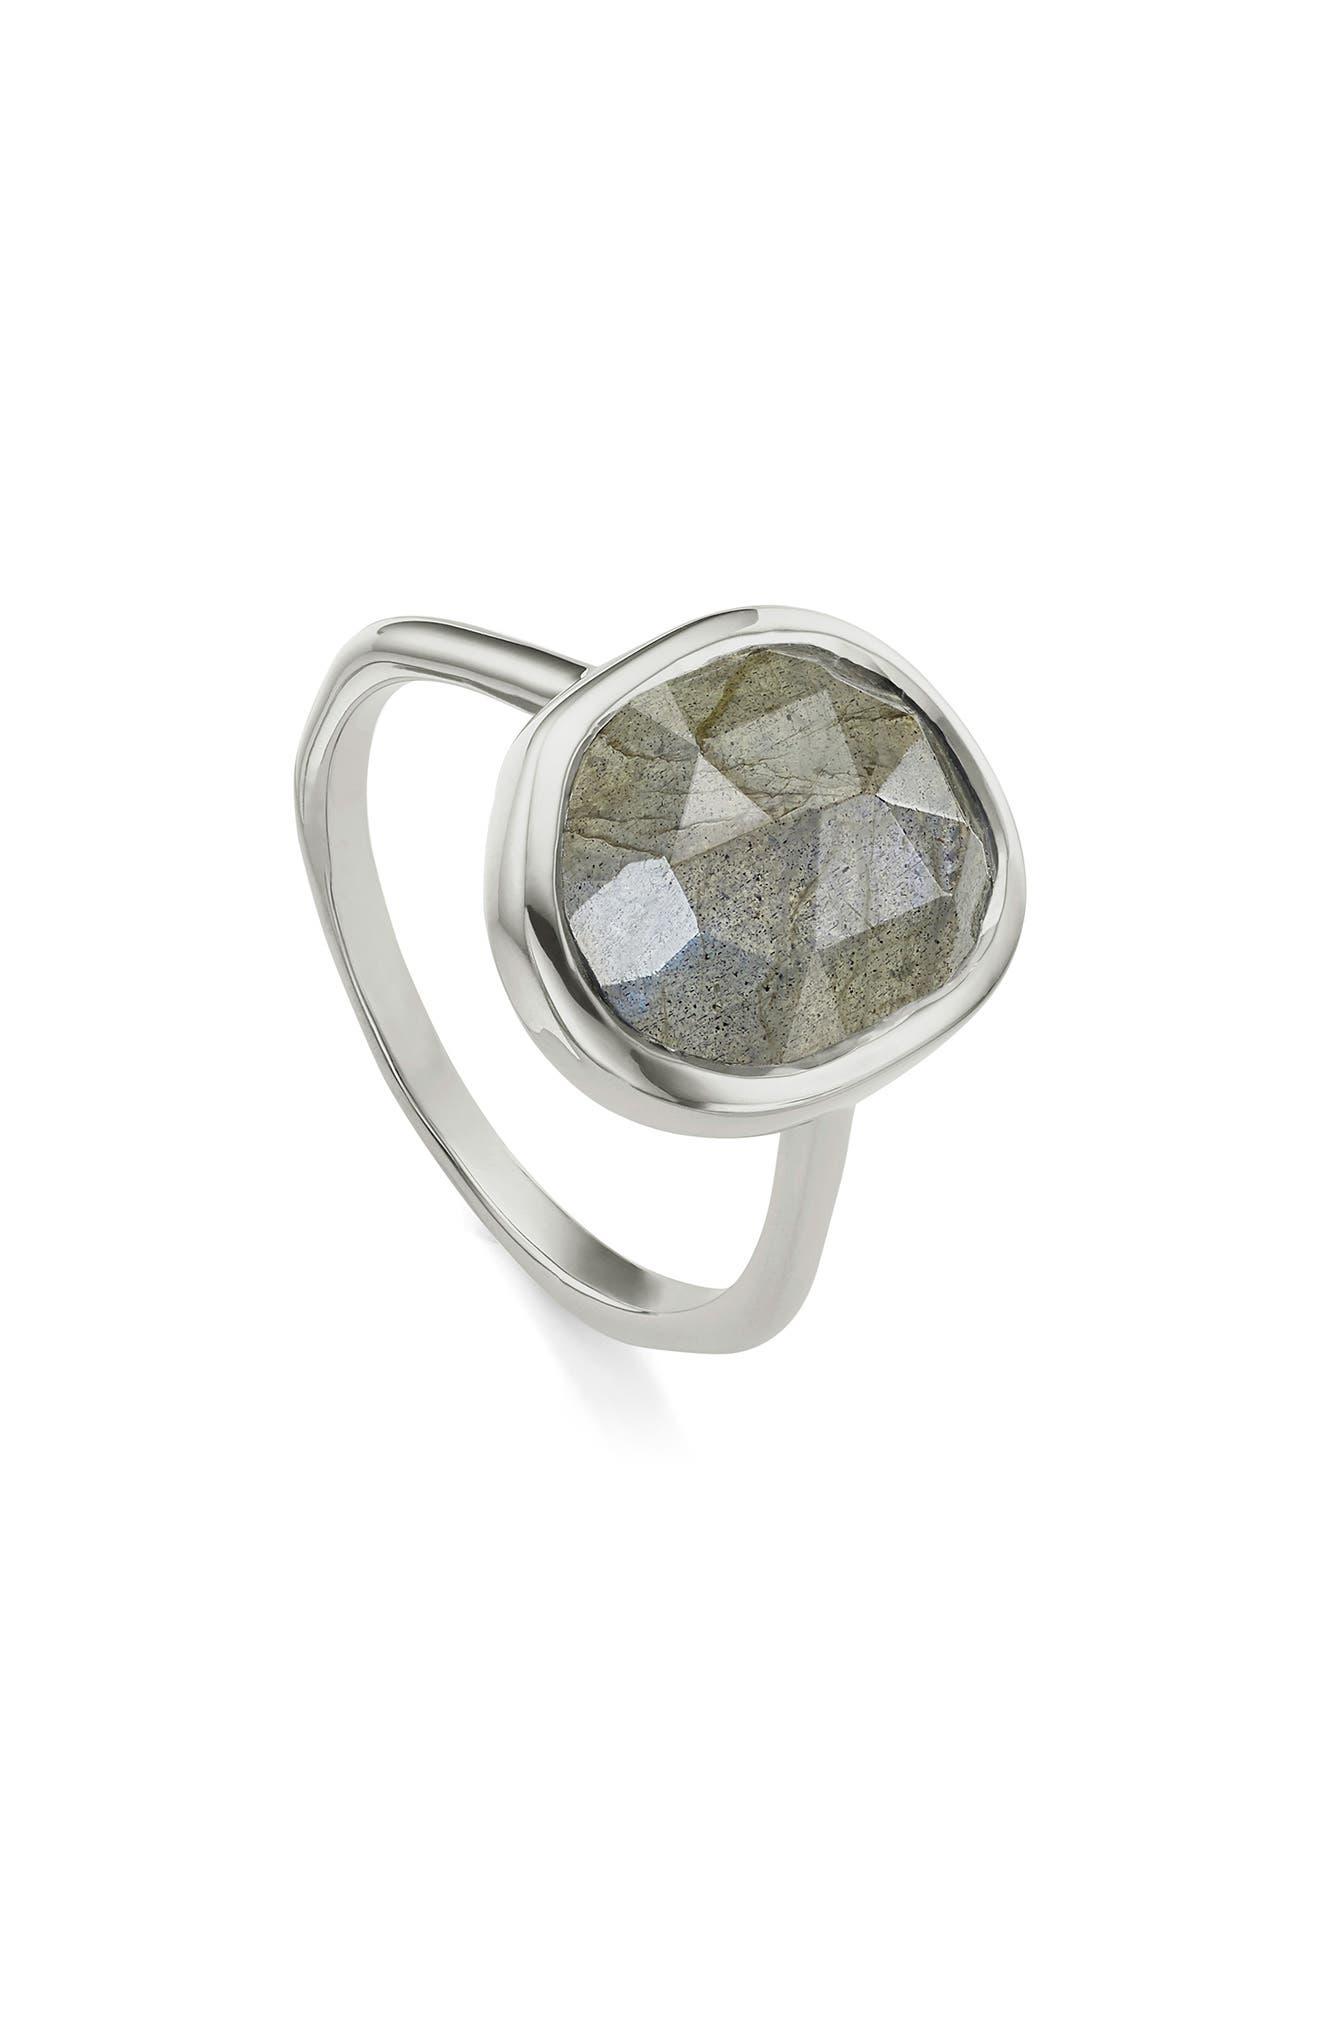 'Siren' Medium Semiprecious Stone Stacking Ring, Silver/ Labradorite